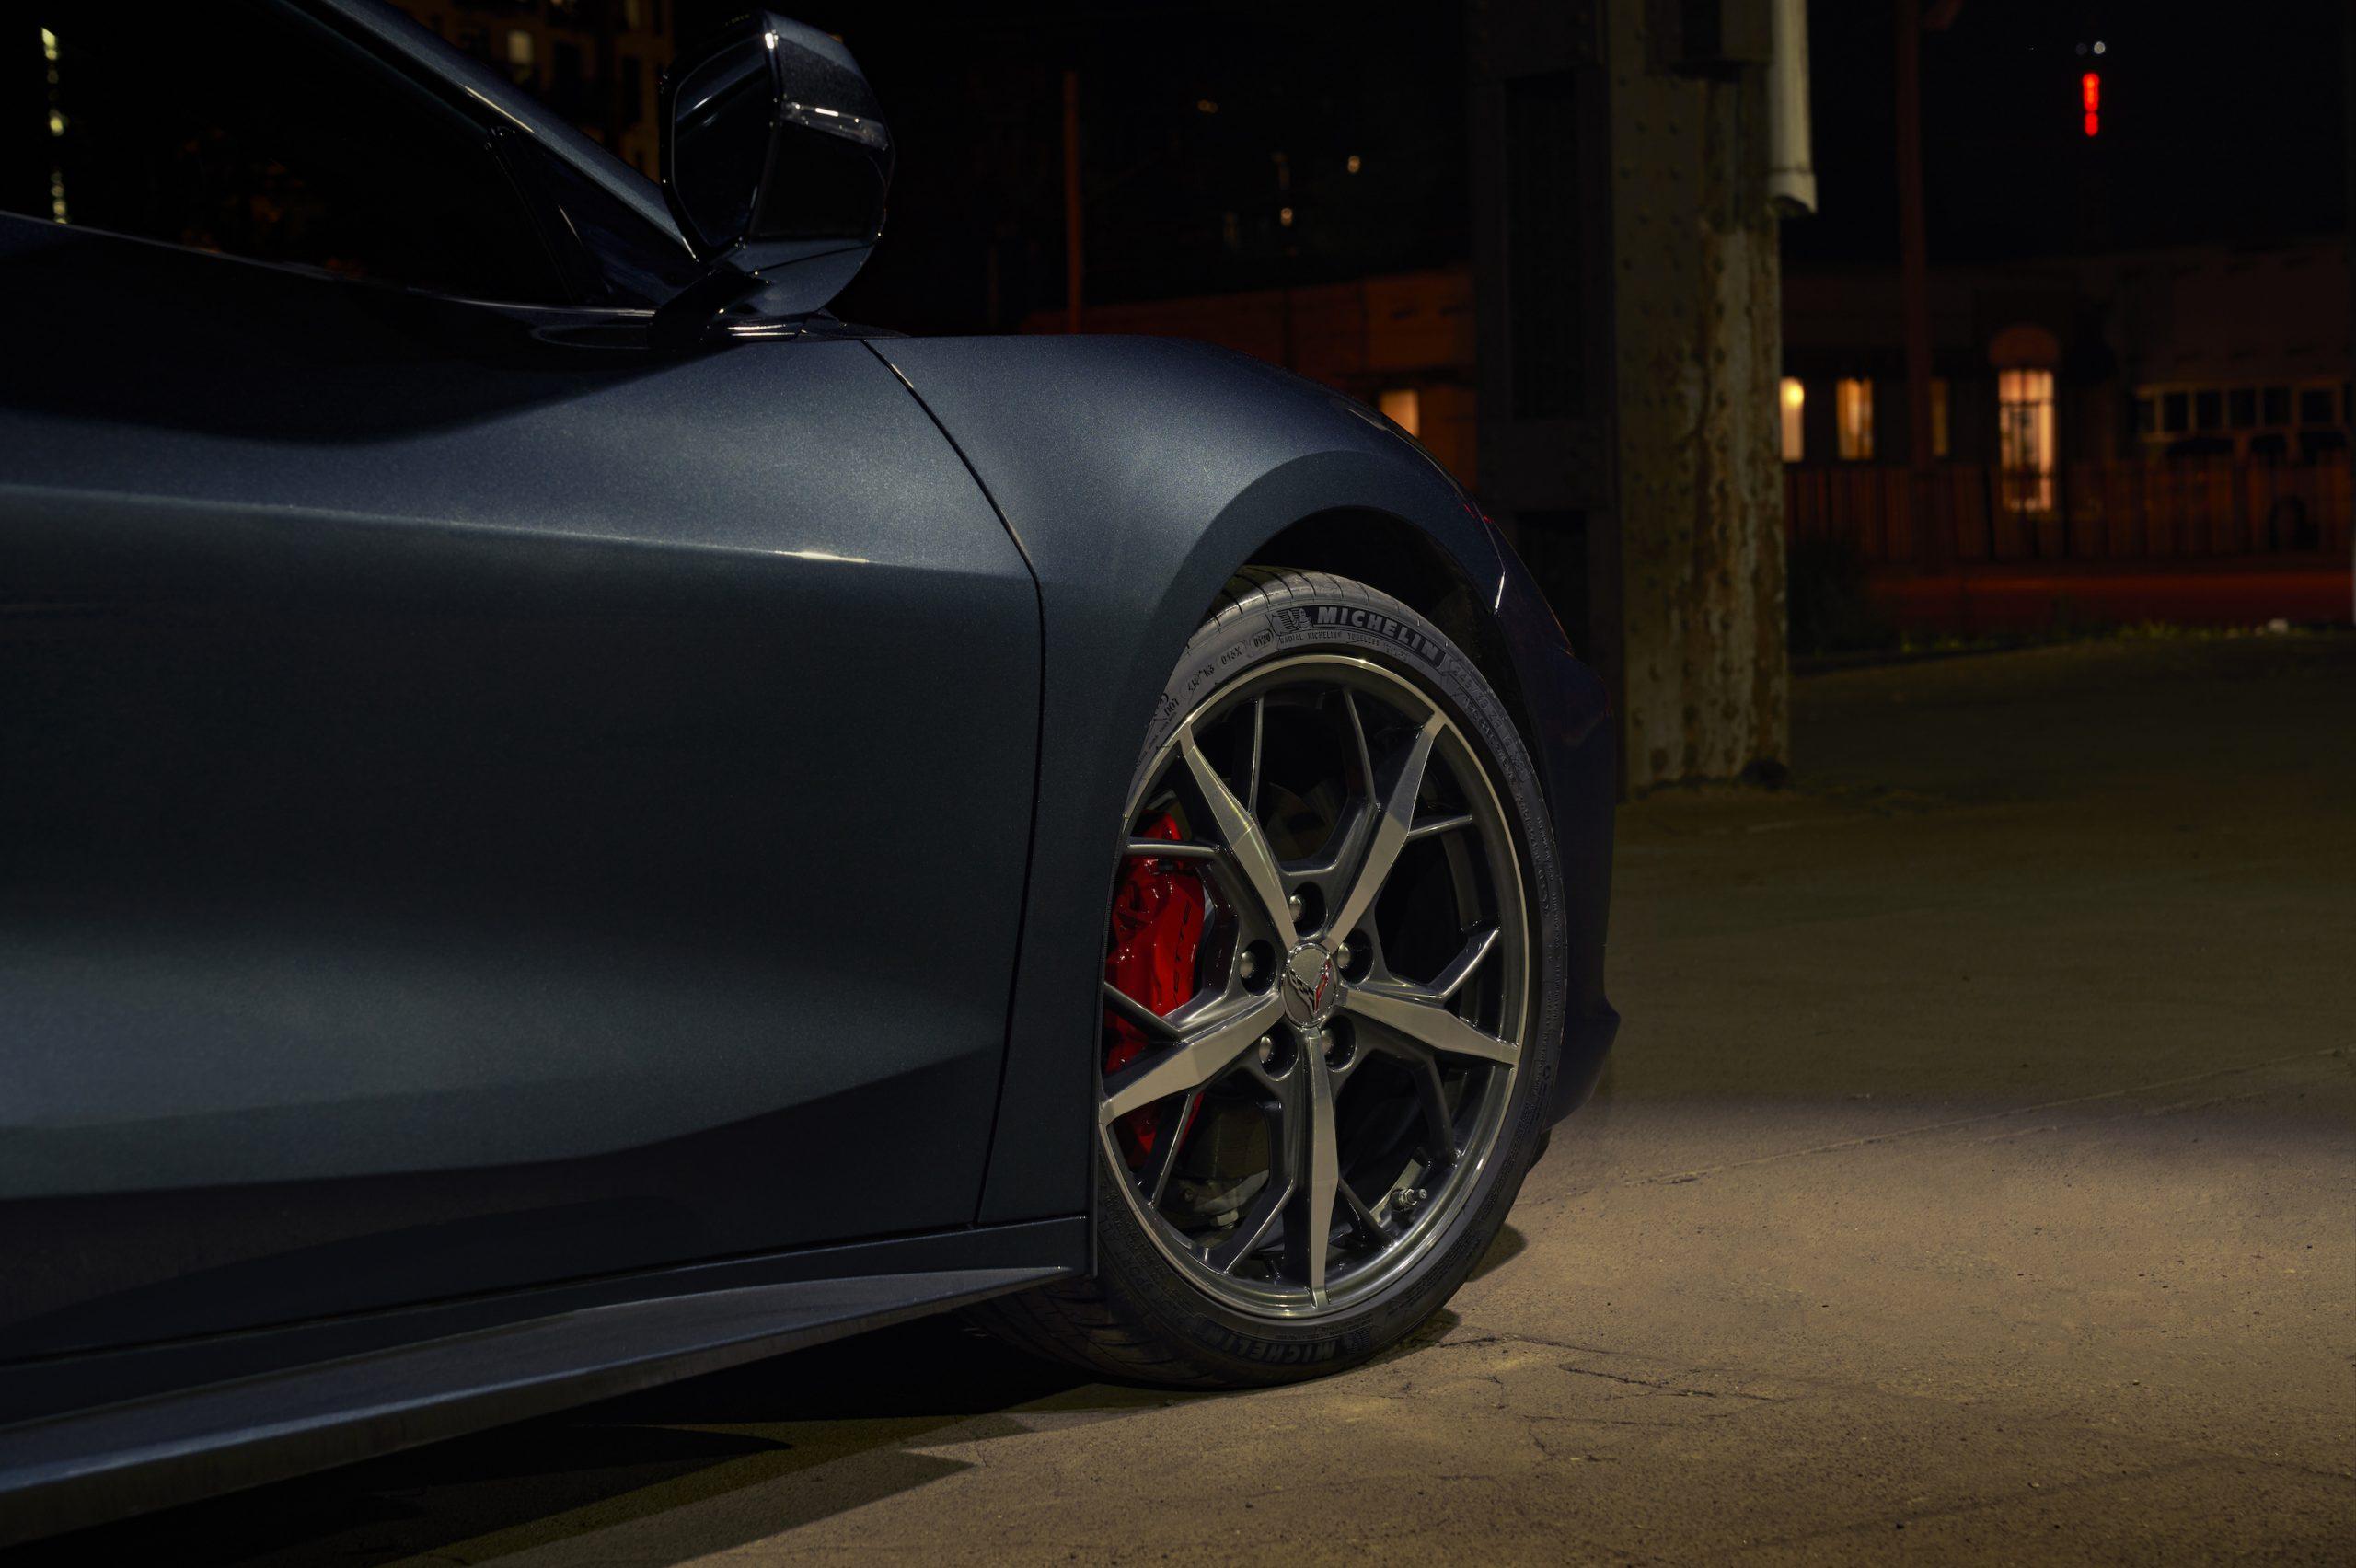 2020 Chevrolet Corvette Stingray 2LT C8 Front Wheel Close